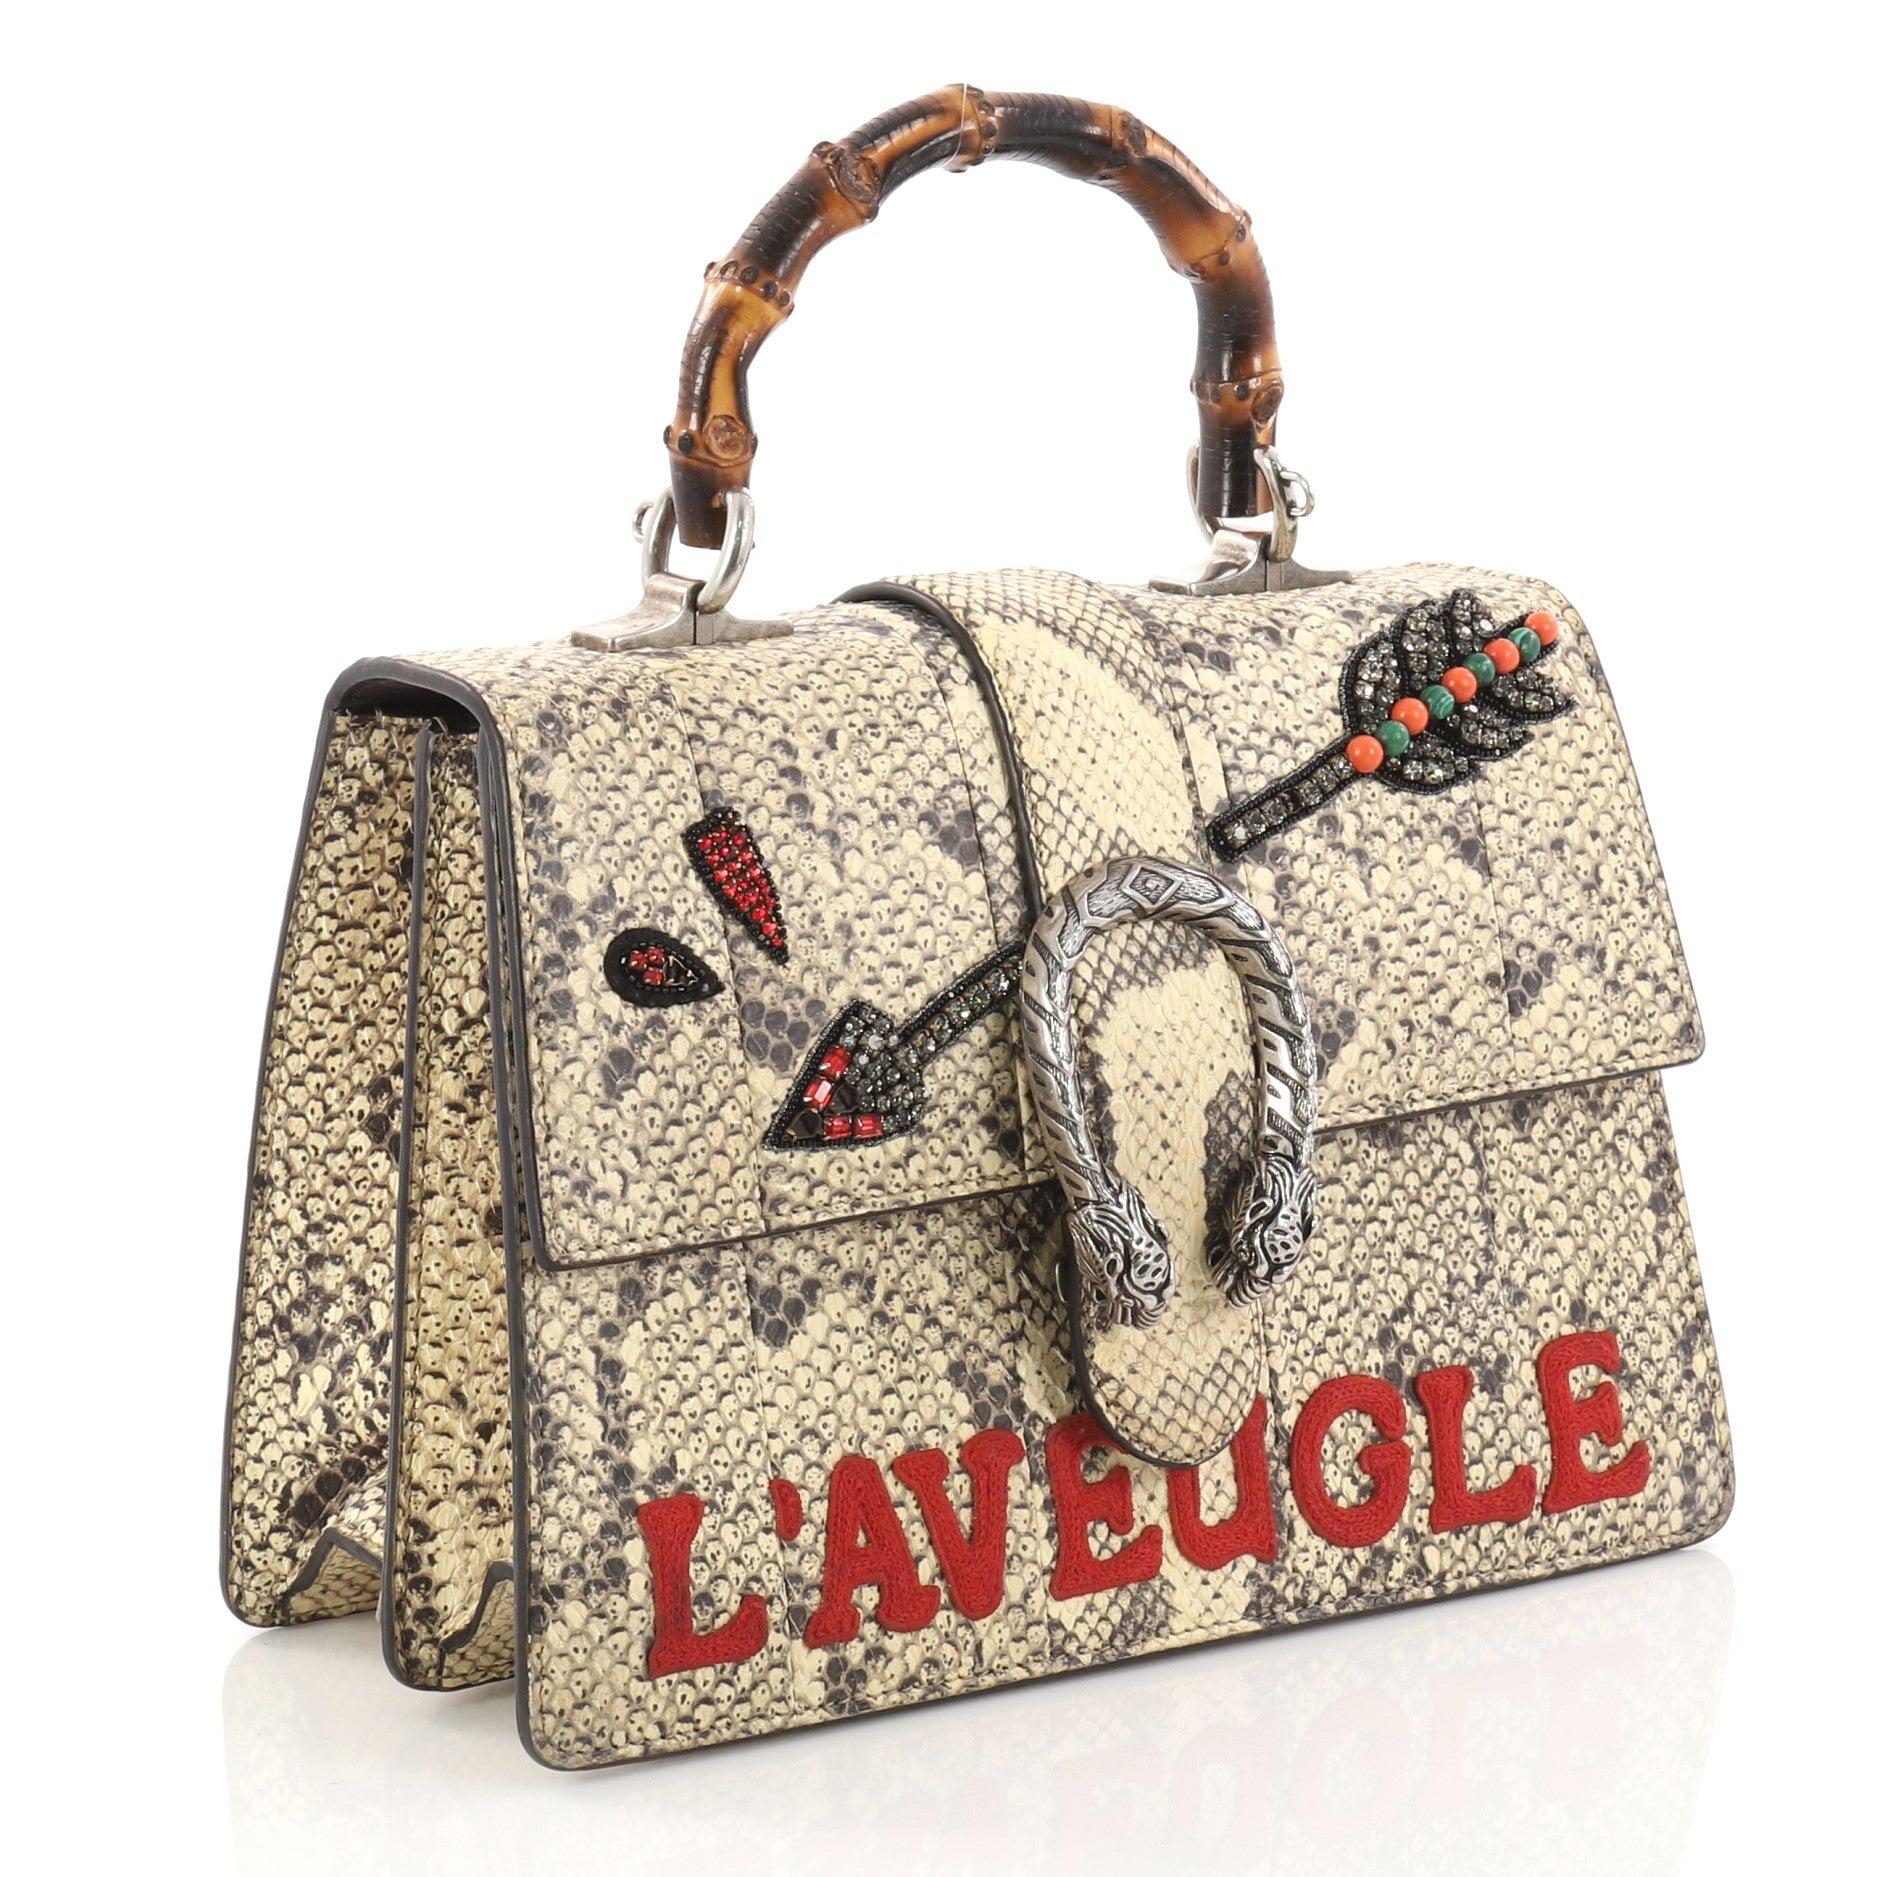 a54669a95 Gucci Dionysus Bamboo Top Handle Bag Embroidered Python Medium at 1stdibs